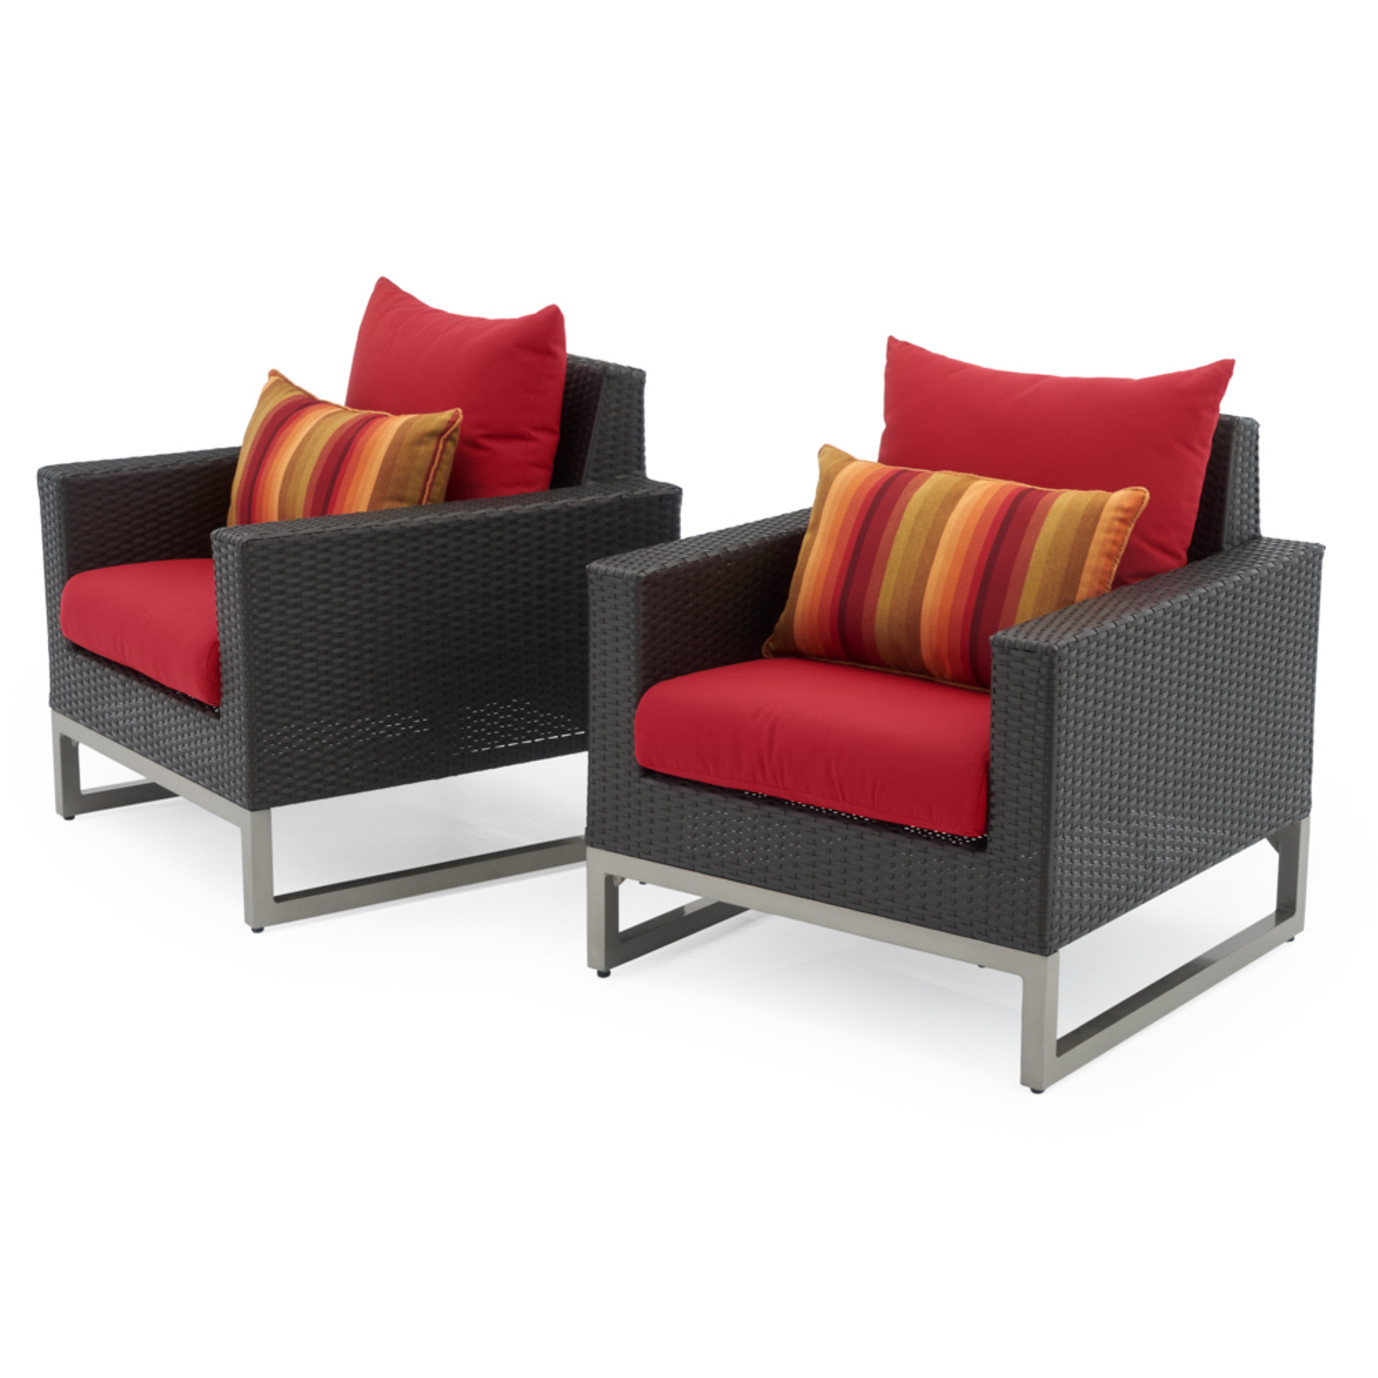 Milo™ Espresso Club Chairs - Sunset Red